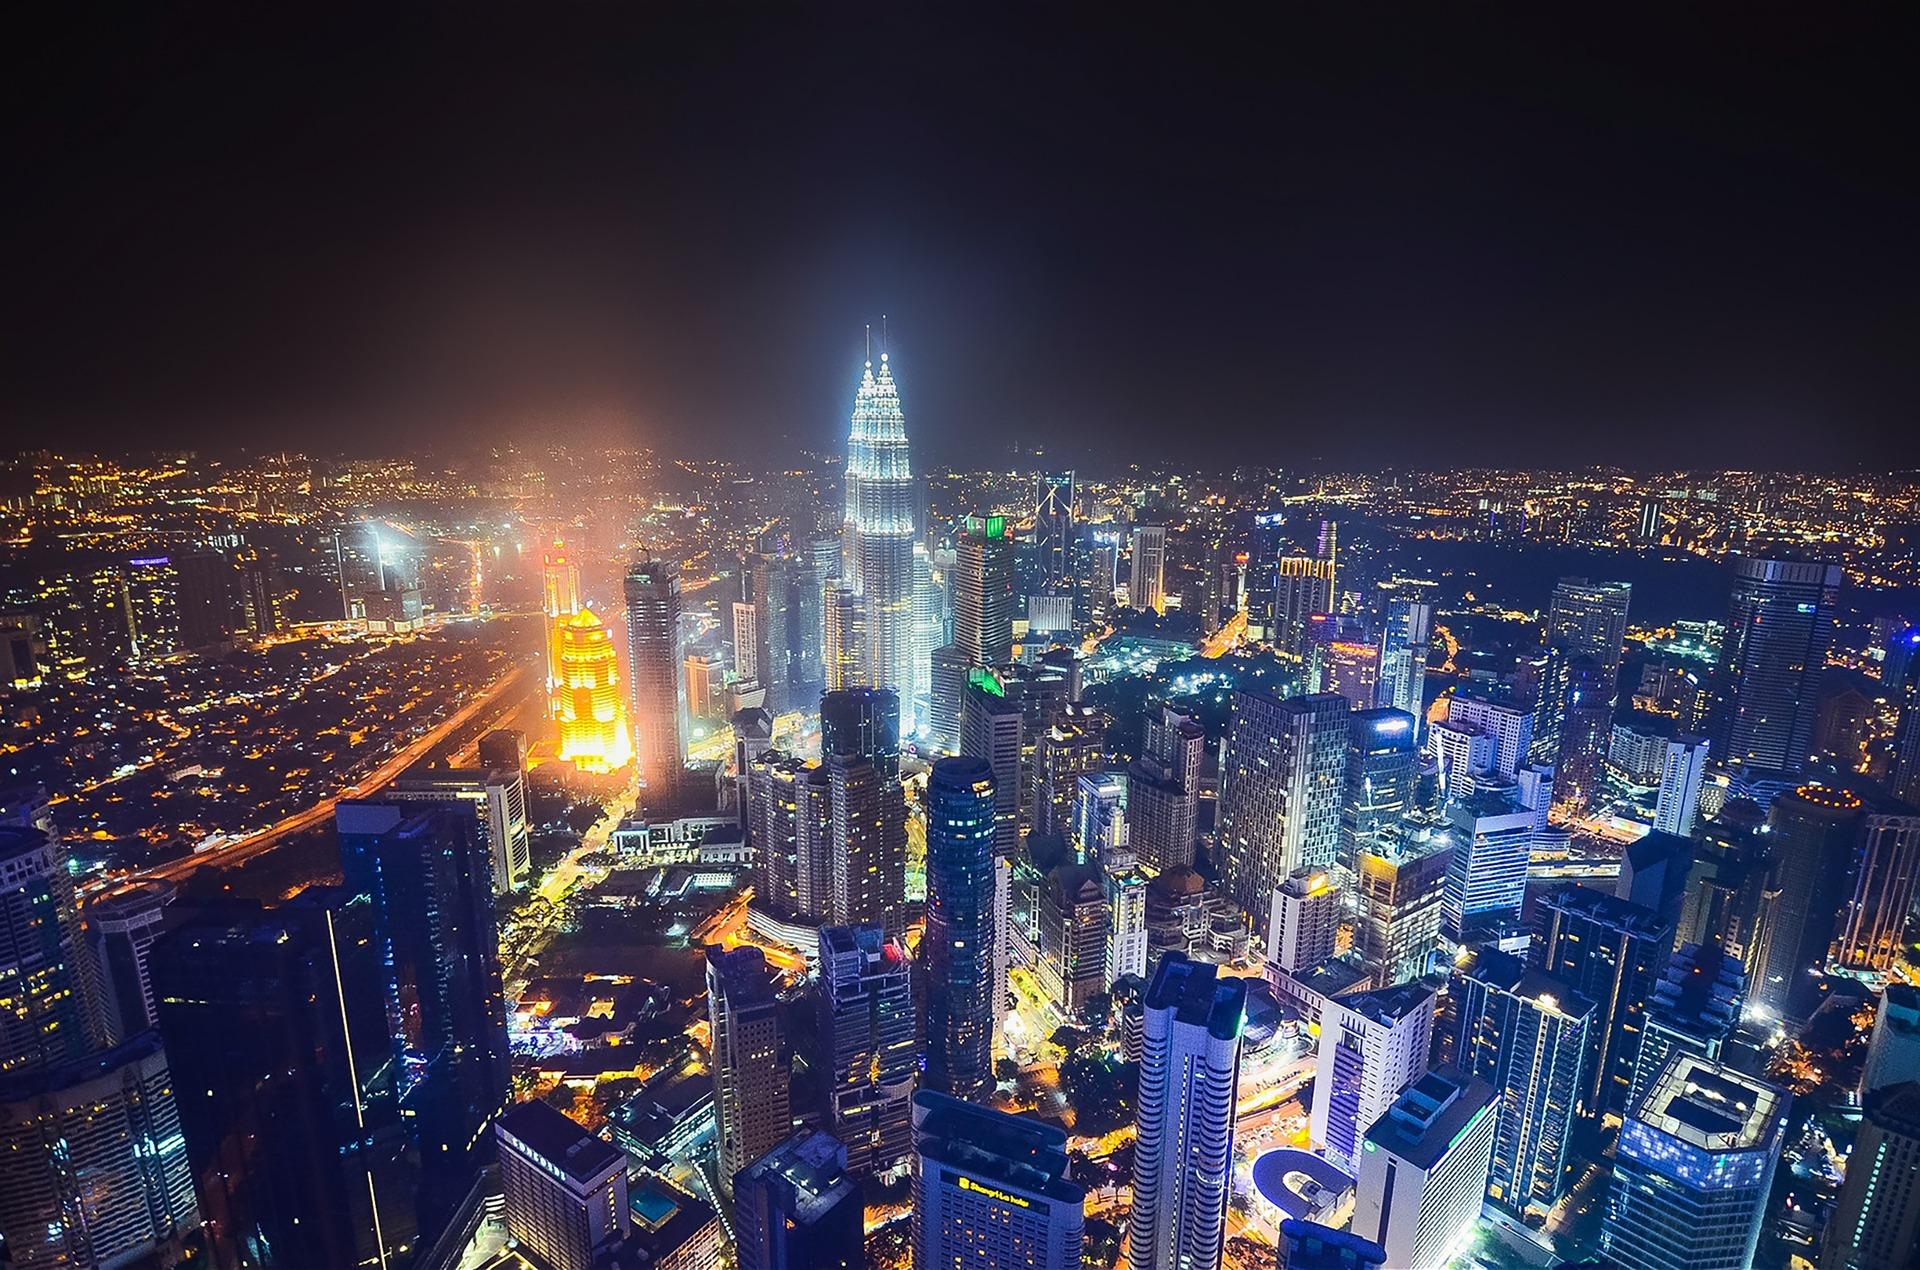 Kuala Lumpur, Malaysia at night